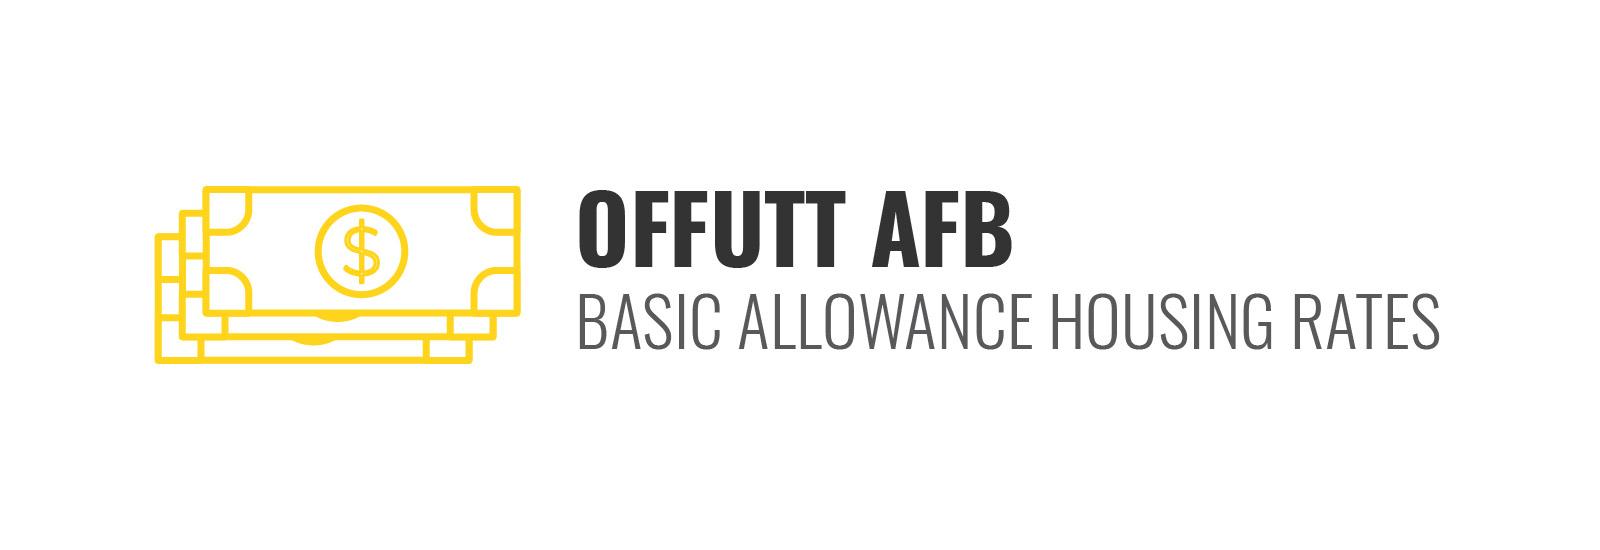 Offutt AFB BAH Rates